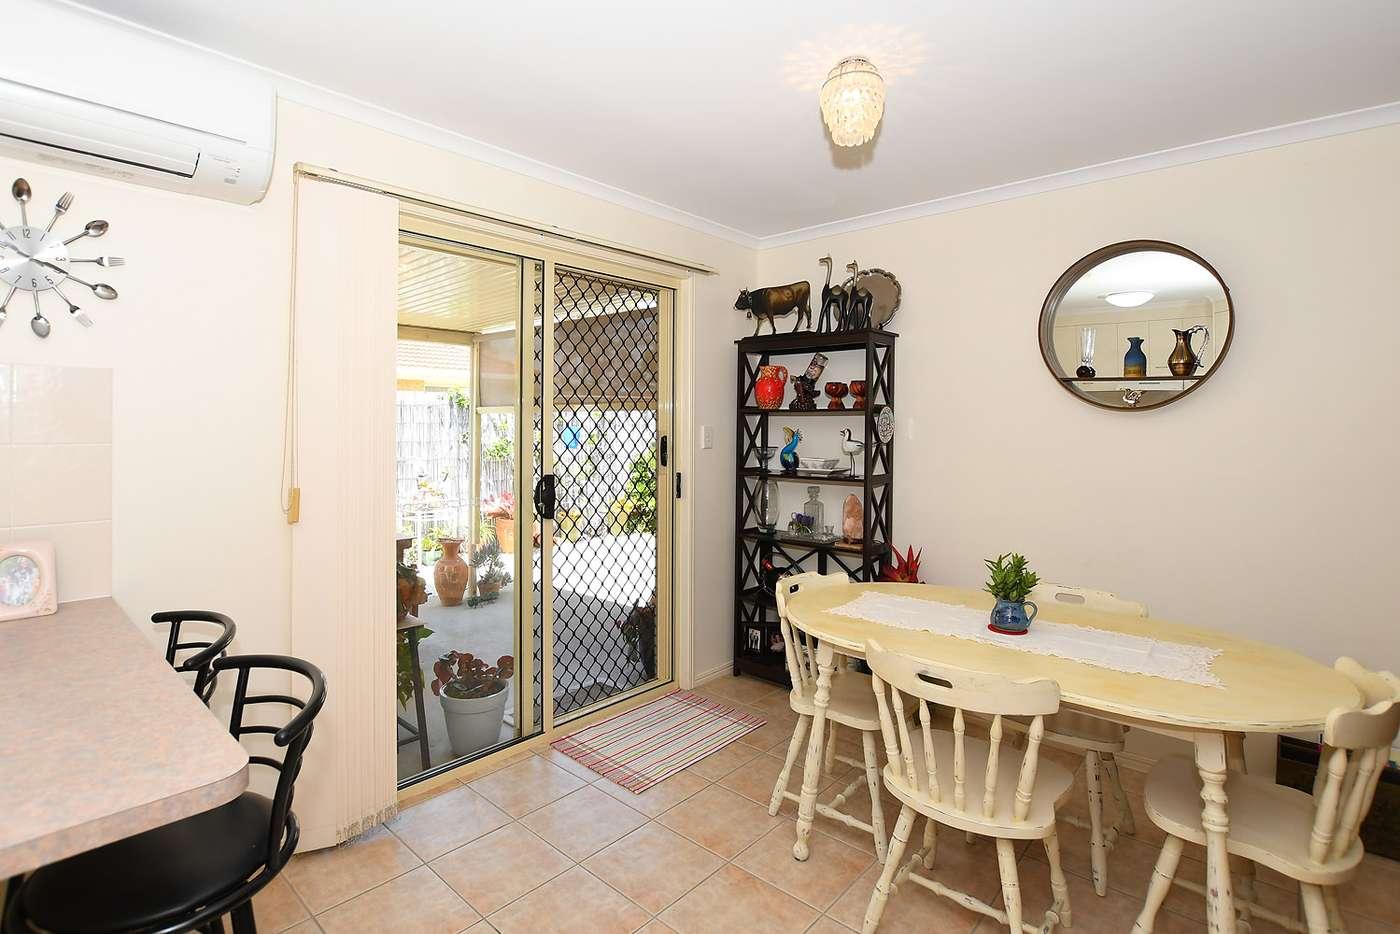 Seventh view of Homely semiDetached listing, Unit 1, 112 BIDEFORD STREET, Torquay QLD 4655